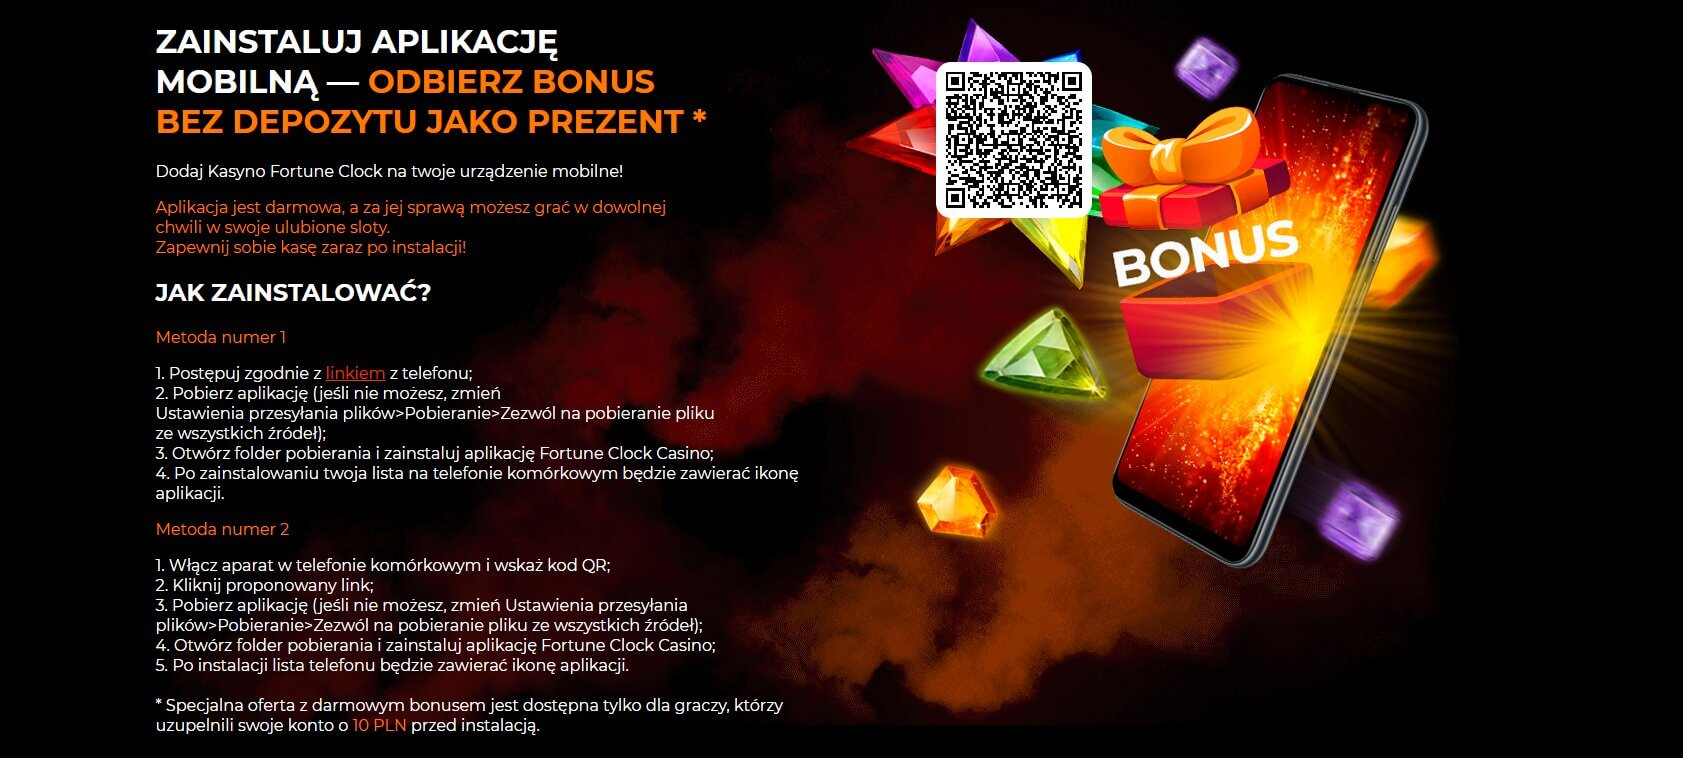 fortune clock casino mobilne i aplikacja screenshot